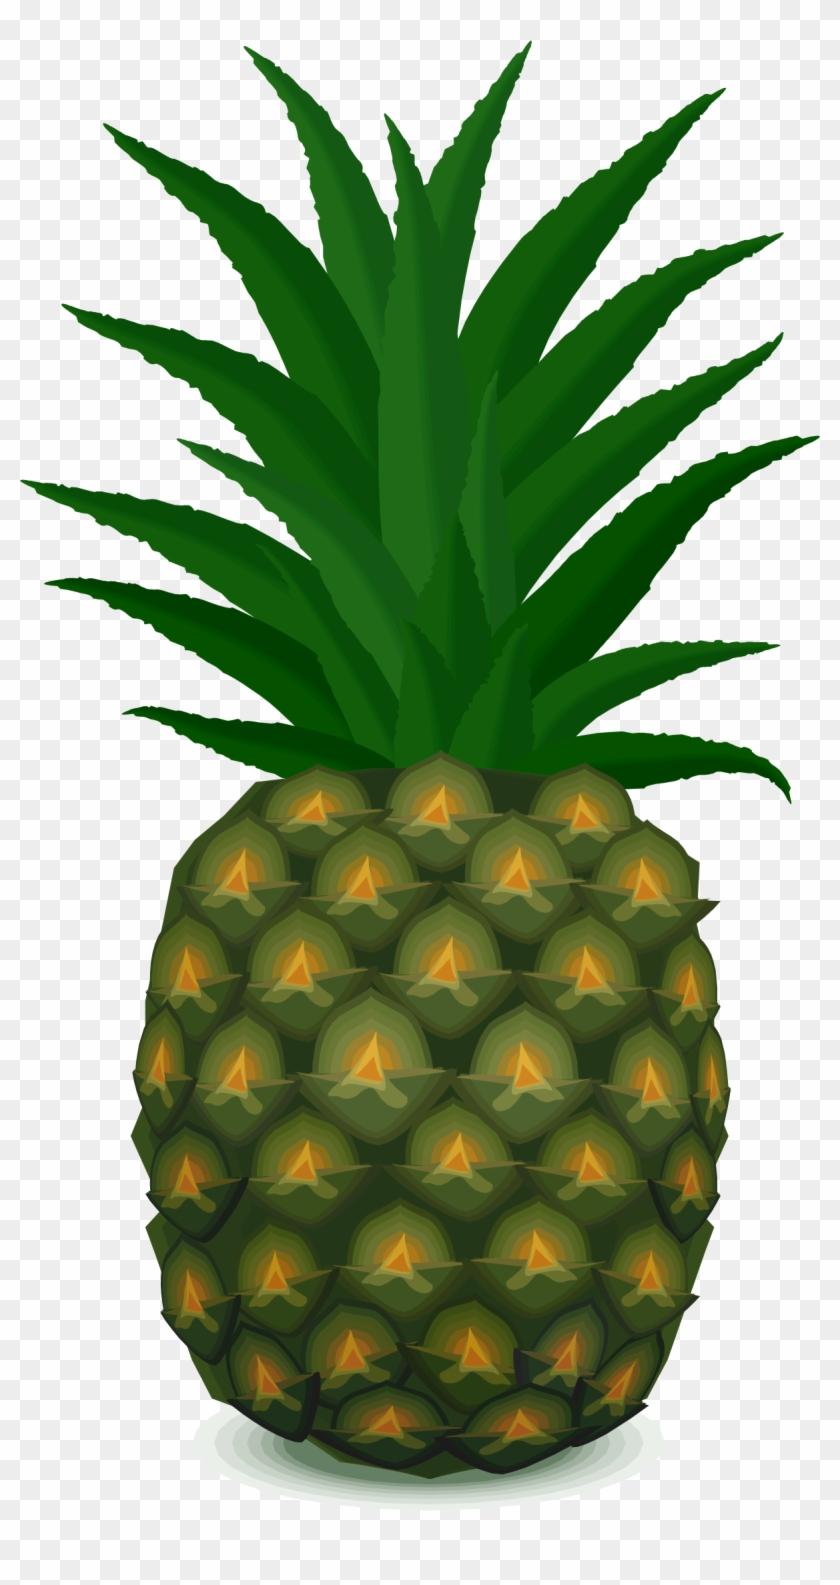 Big Image - Heart (love) Pineapple Throw Blanket #274271